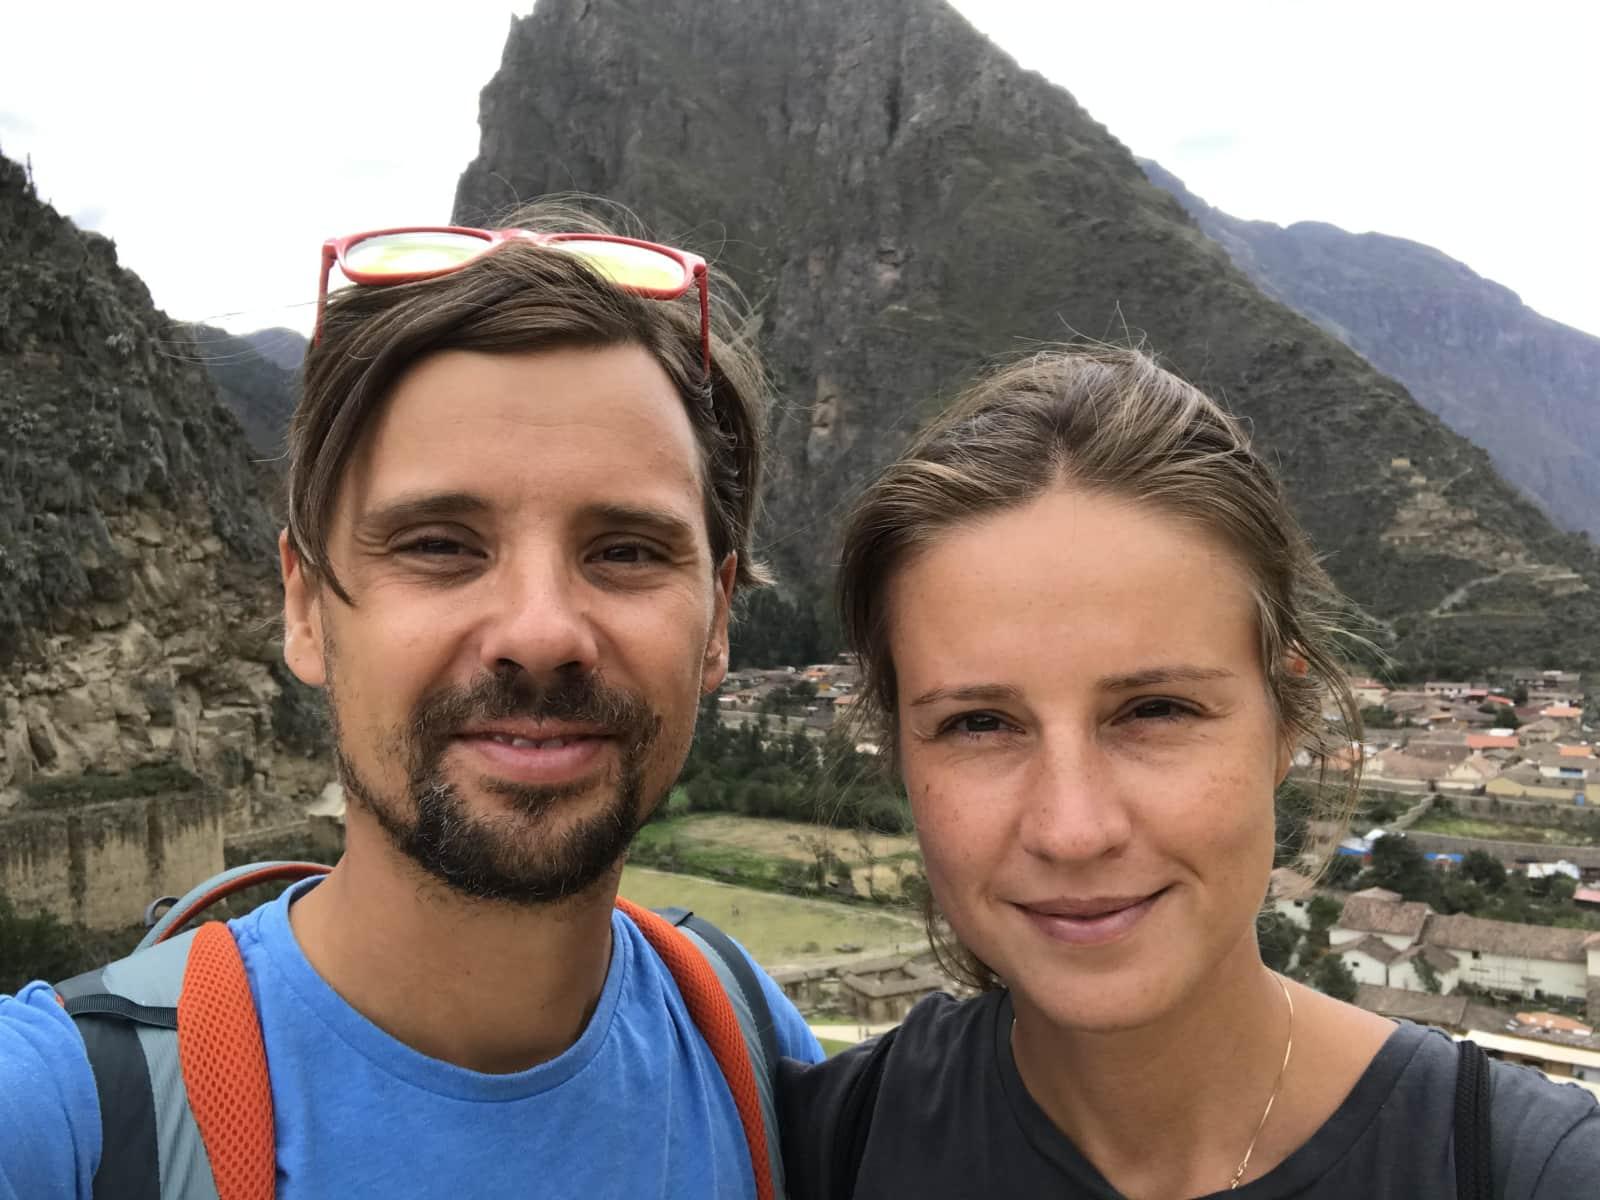 Istvan & Klaudia from Budapest, Hungary